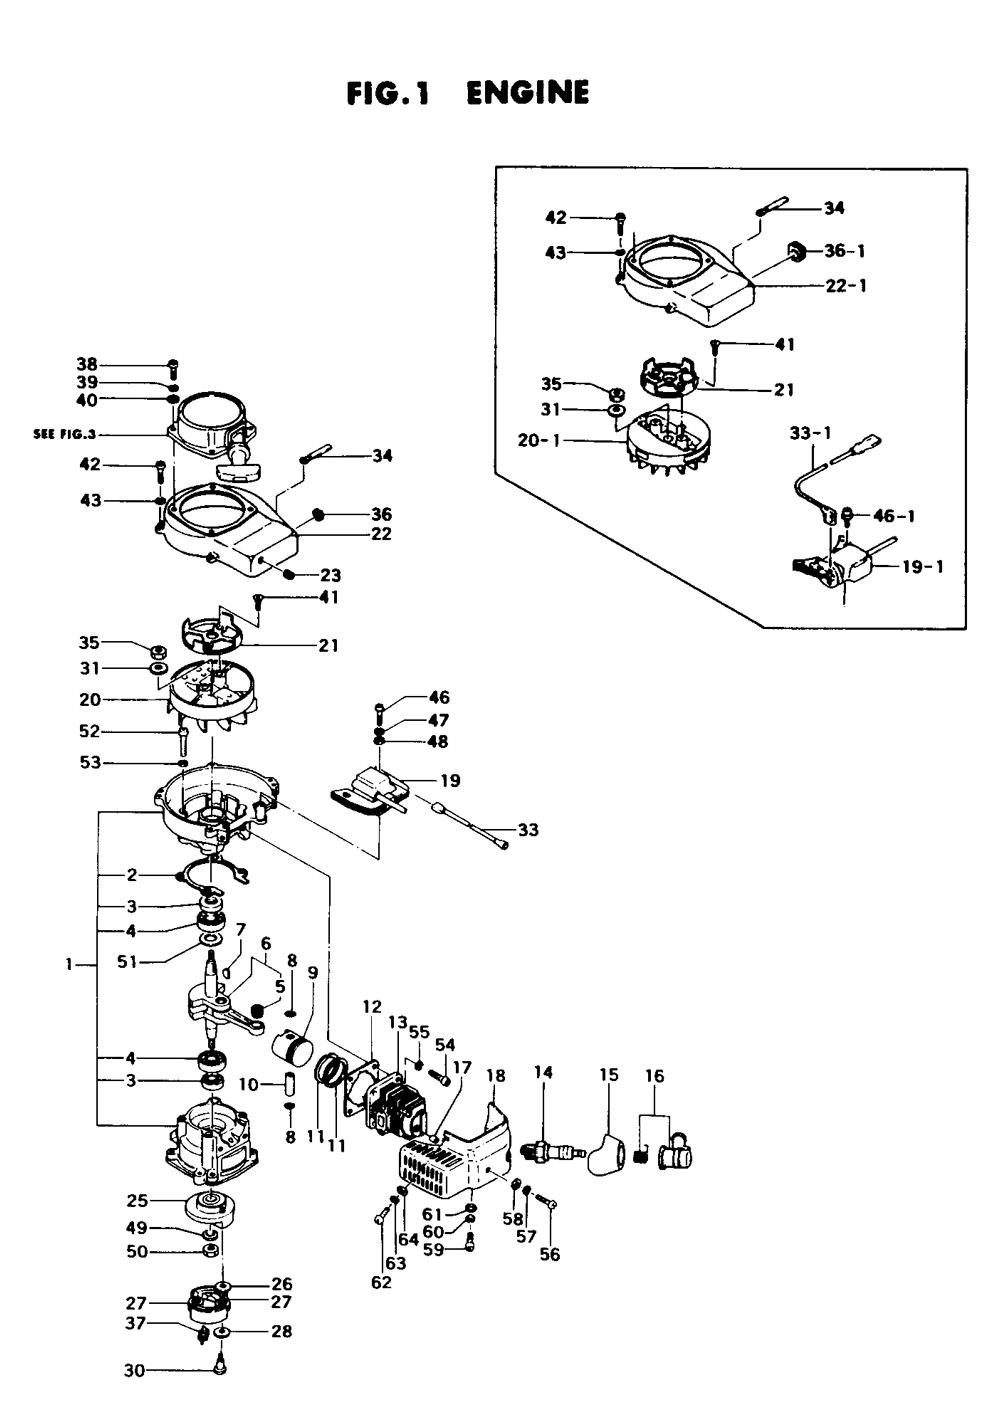 Piston Replacement Part Hitachi 6686014 Pin